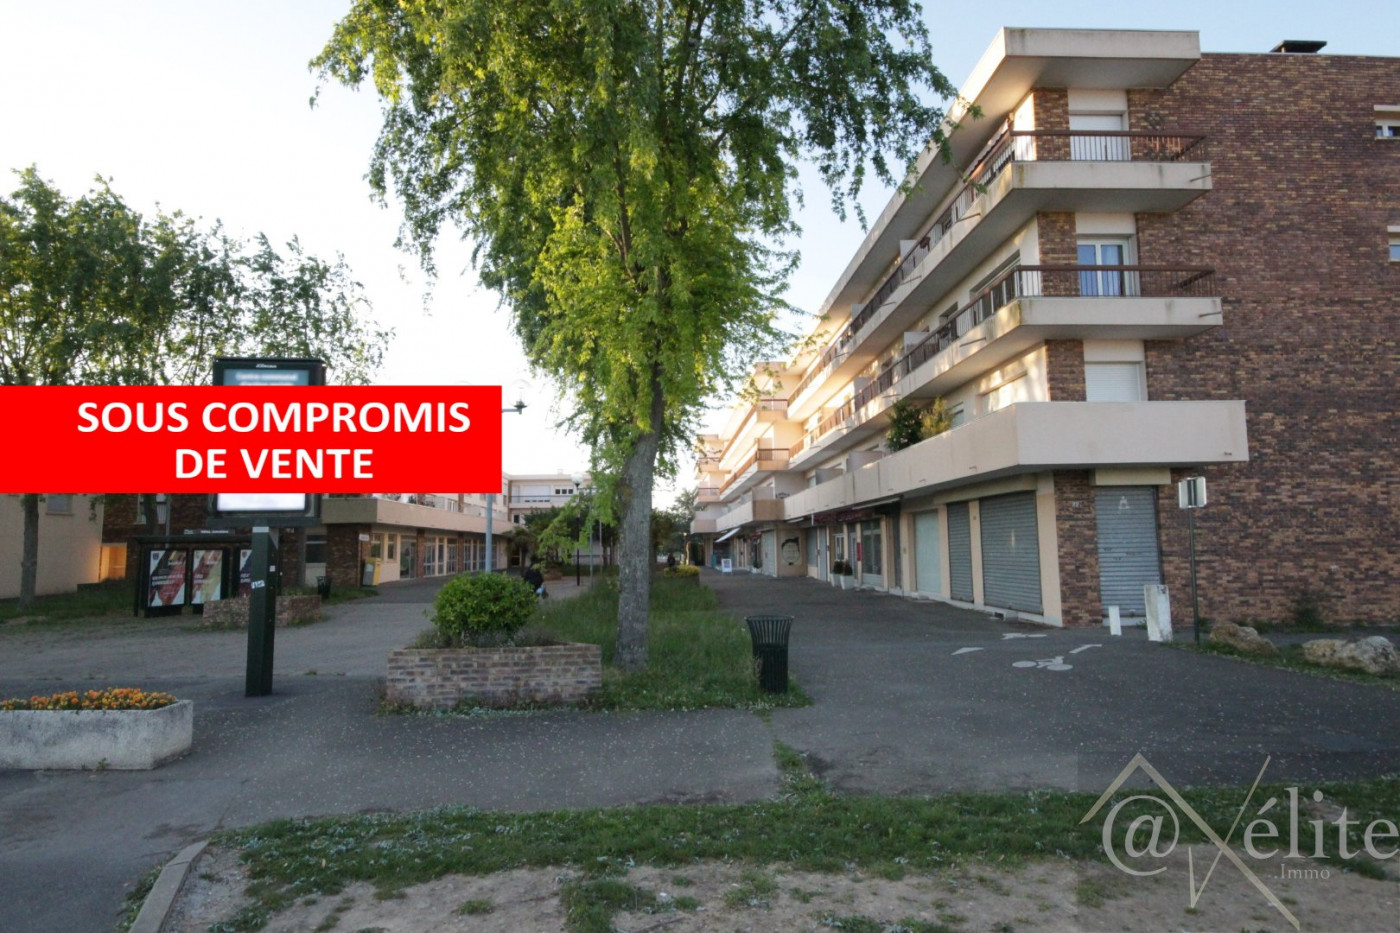 A vendre  Rambouillet | Réf 777922770 - Axelite sas